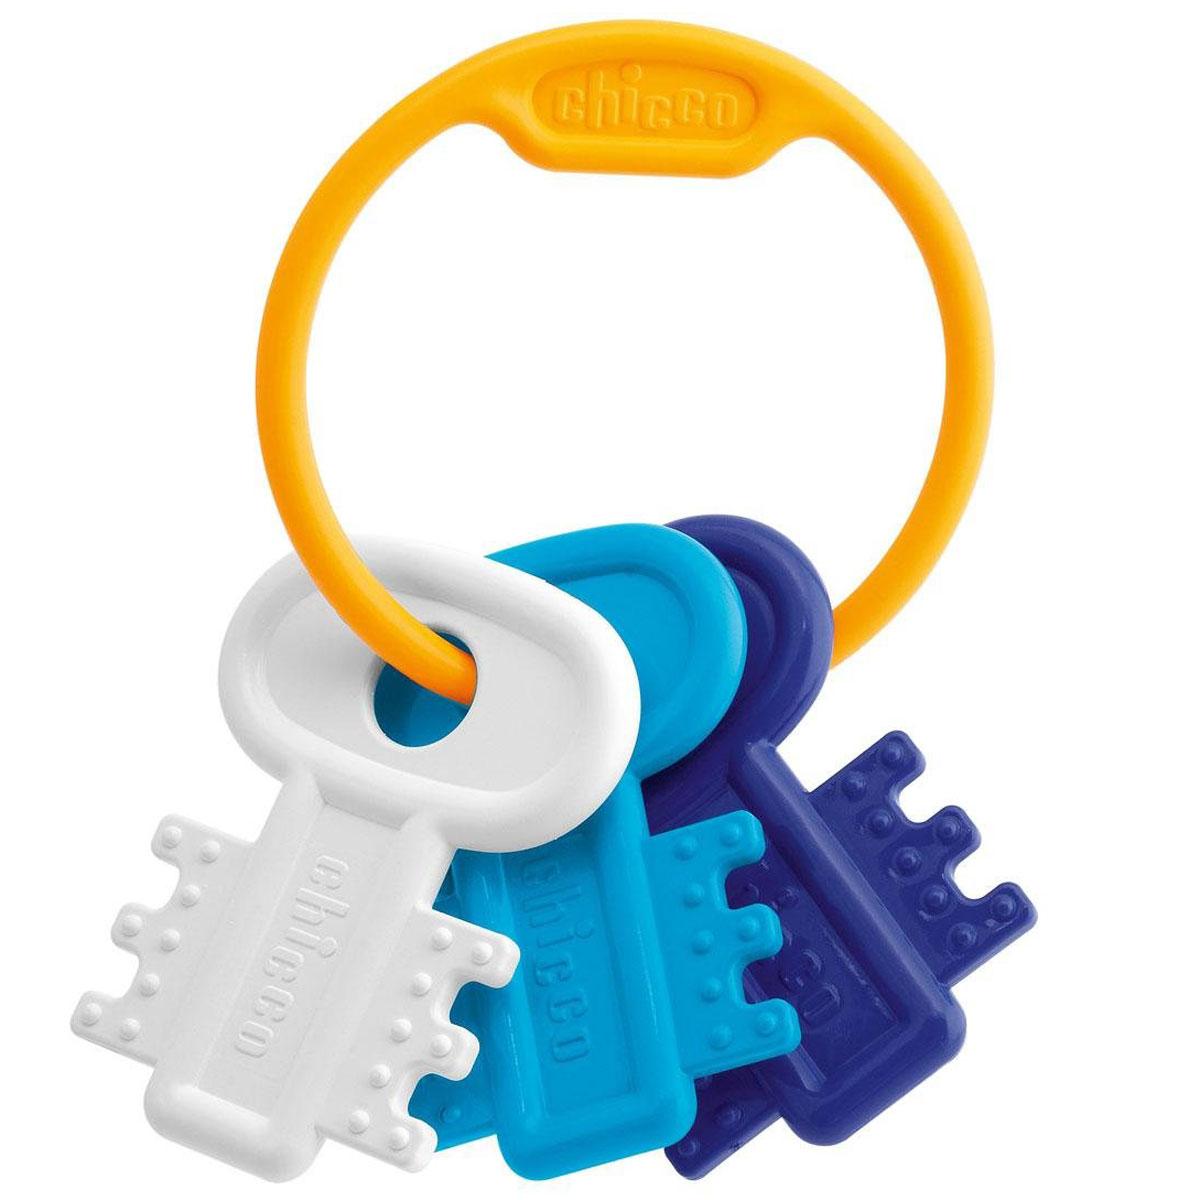 Chicco Погремушка Ключи на кольце цвет белый голубой погремушка lubby ключи цвет в ассортименте